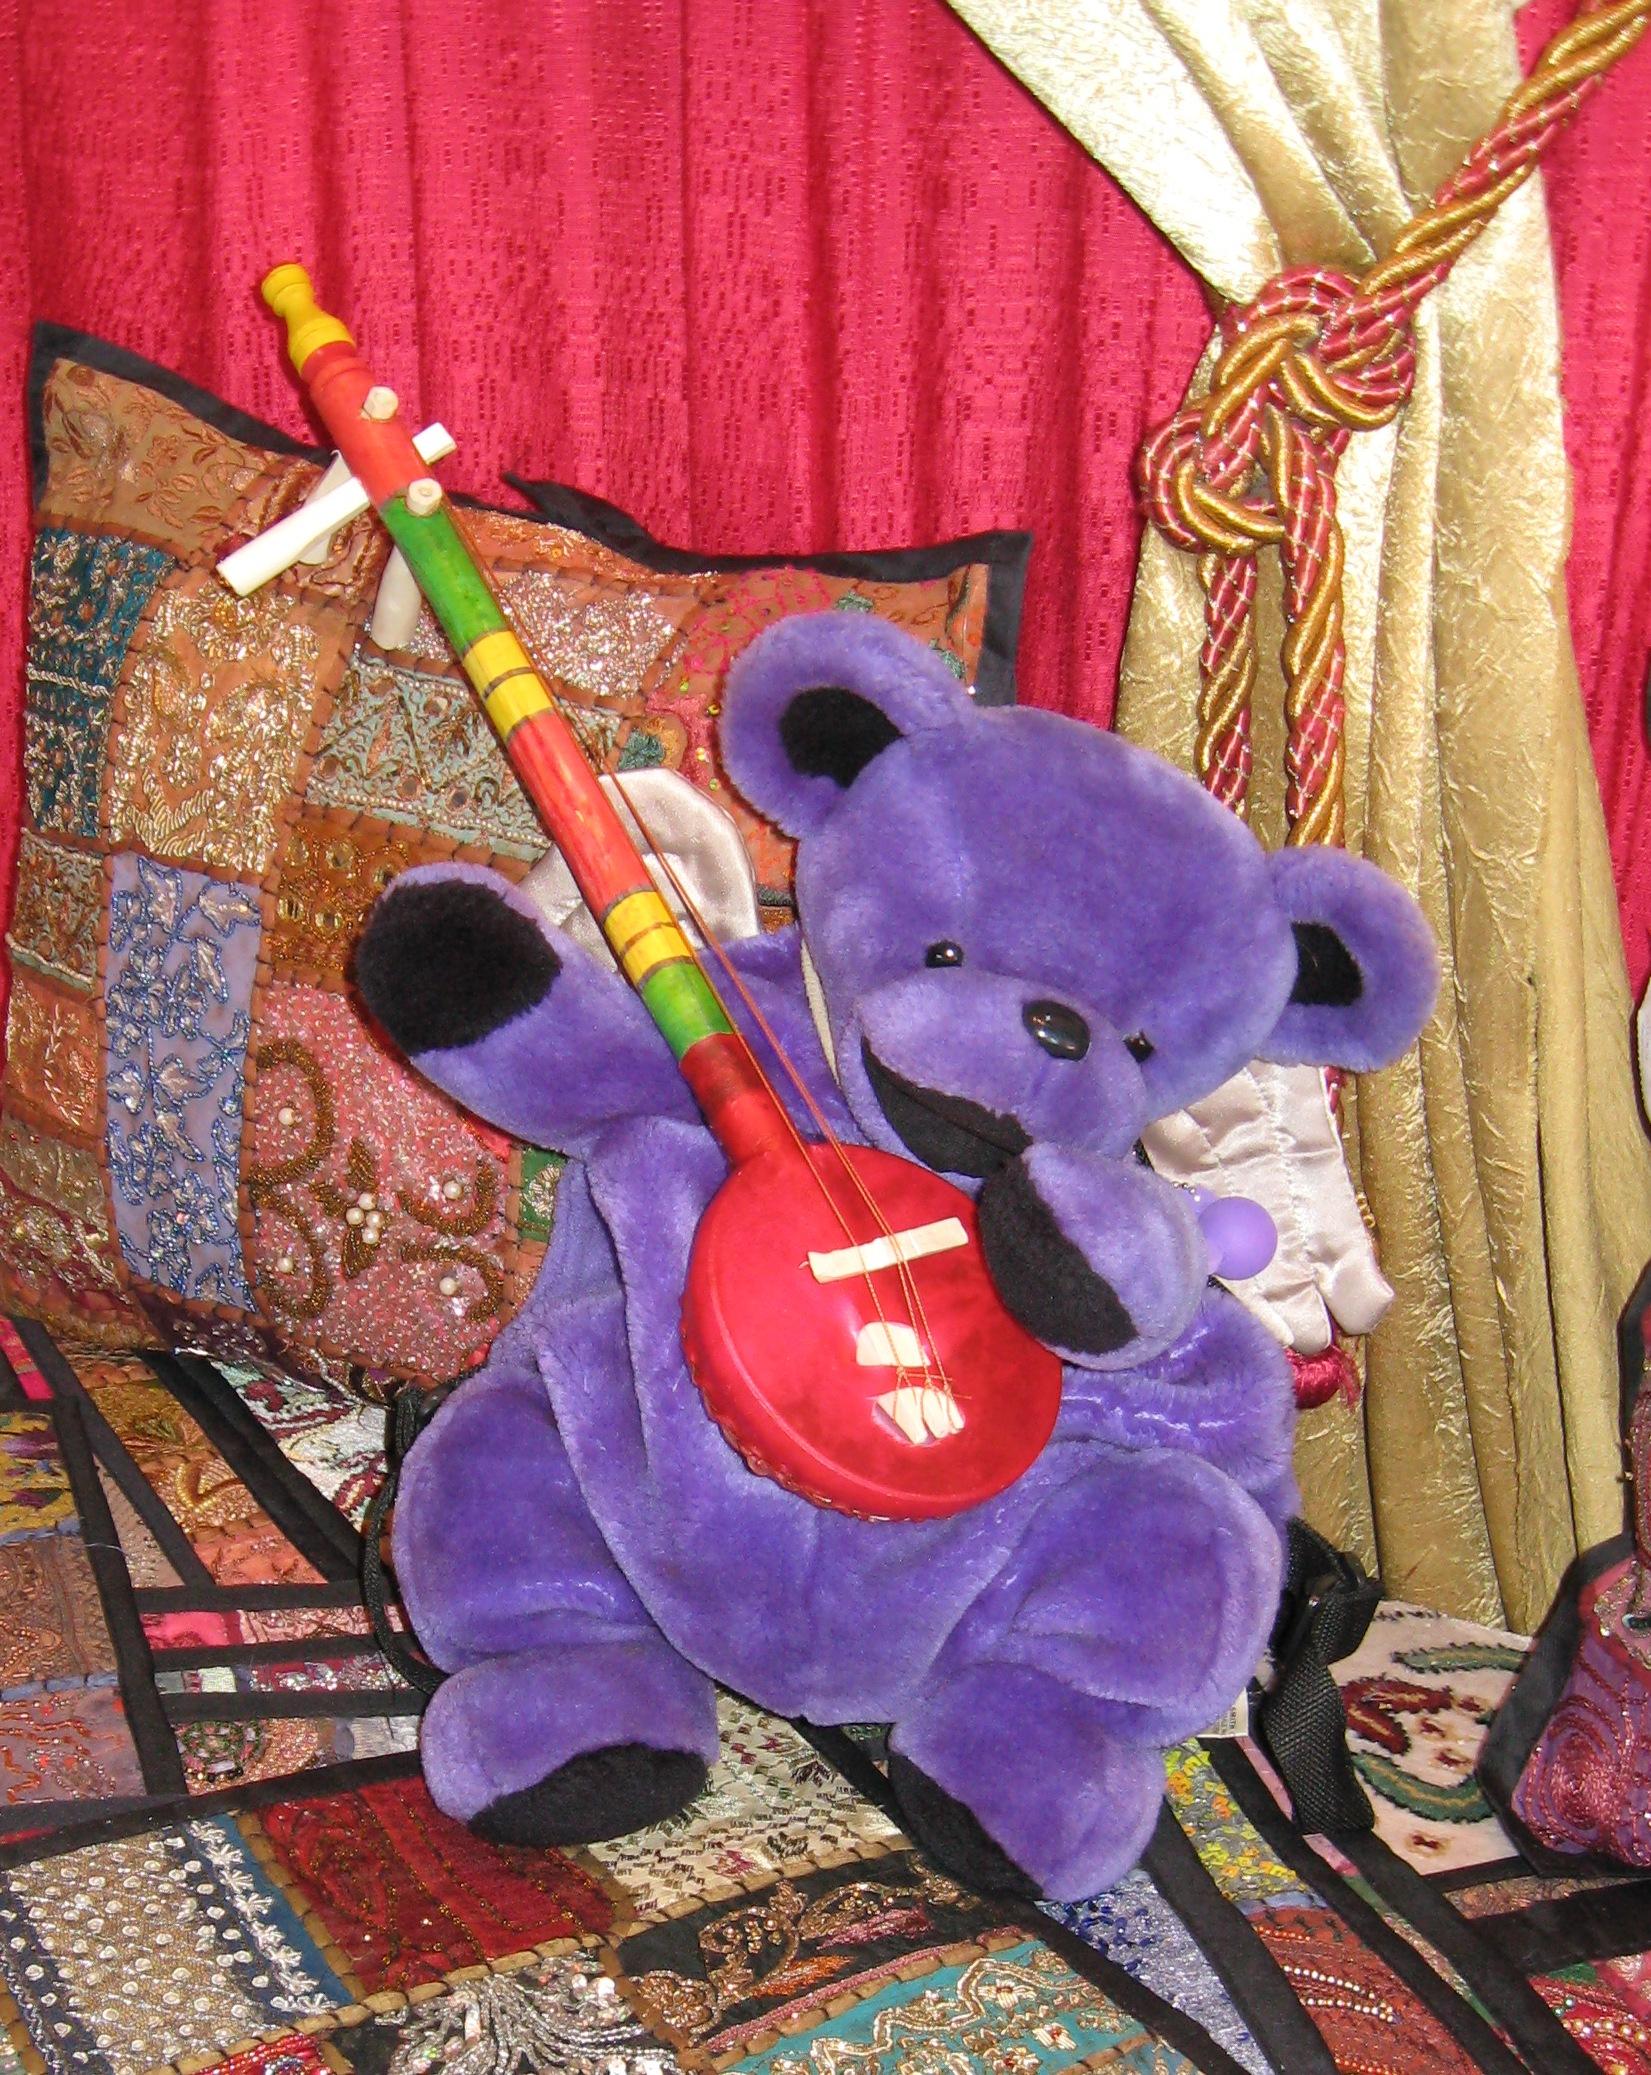 Disney epcot morroco market music and the bear